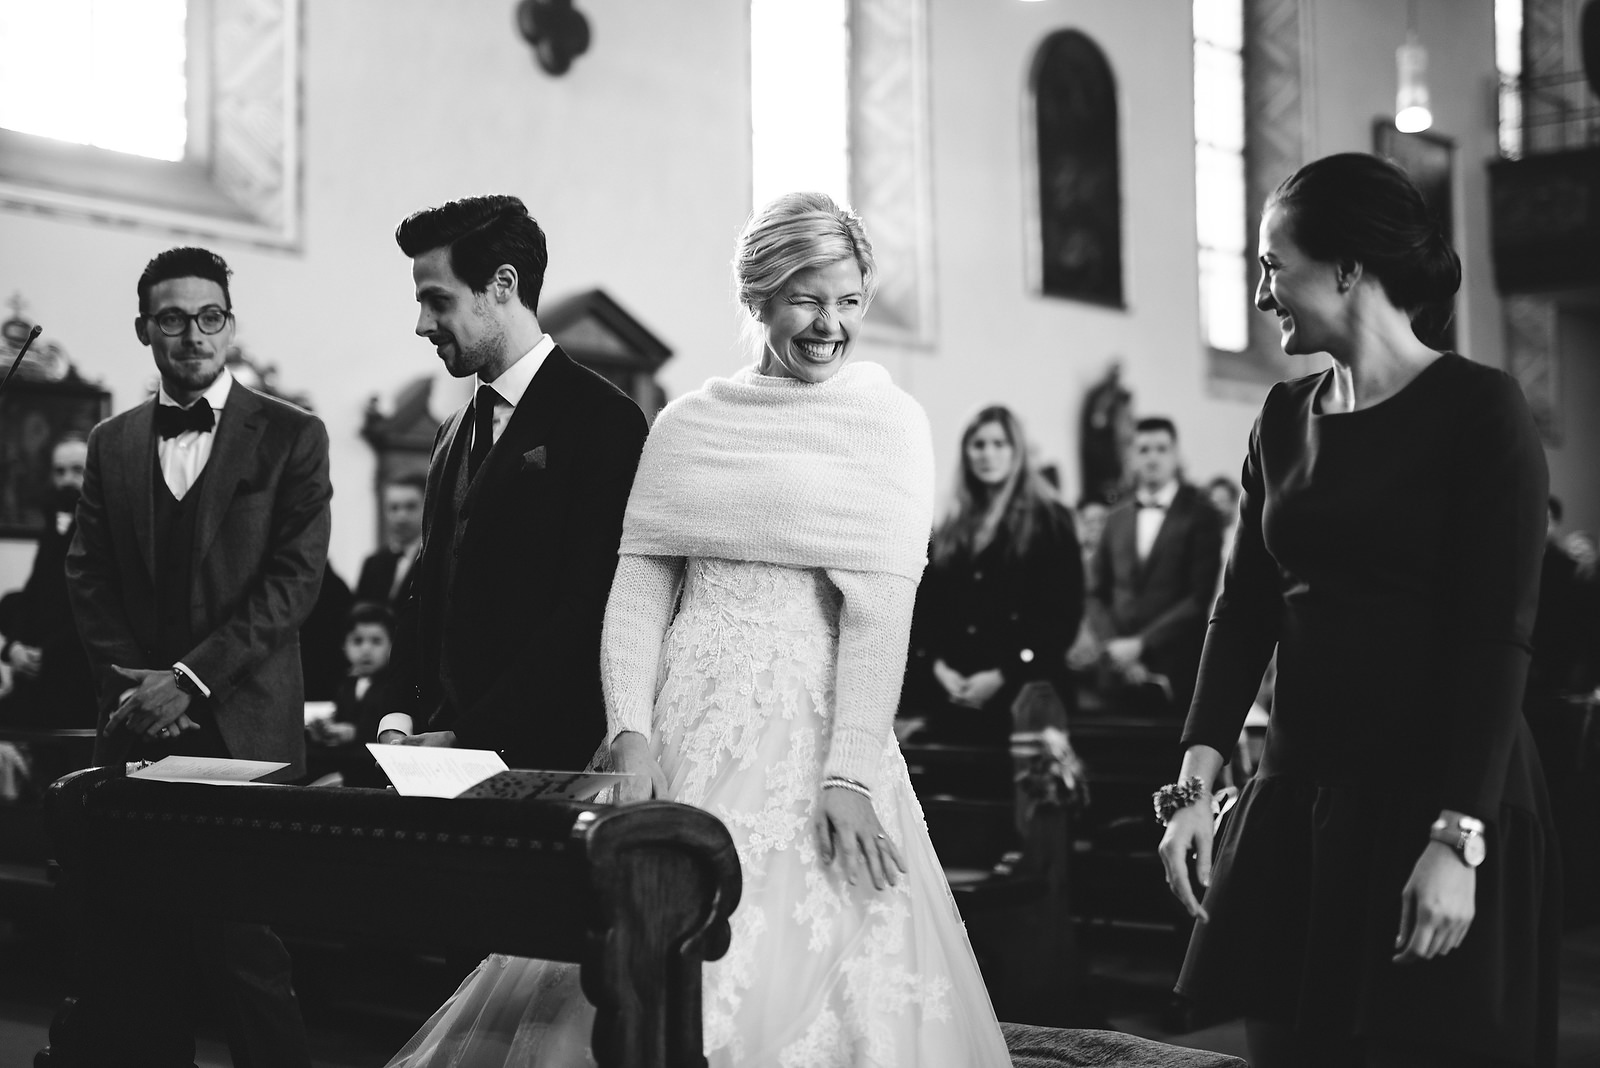 Fotograf Konstanz - Silvester Wedding in Hagnau / Friedrichshafen at Lake of Constance  - 14 -